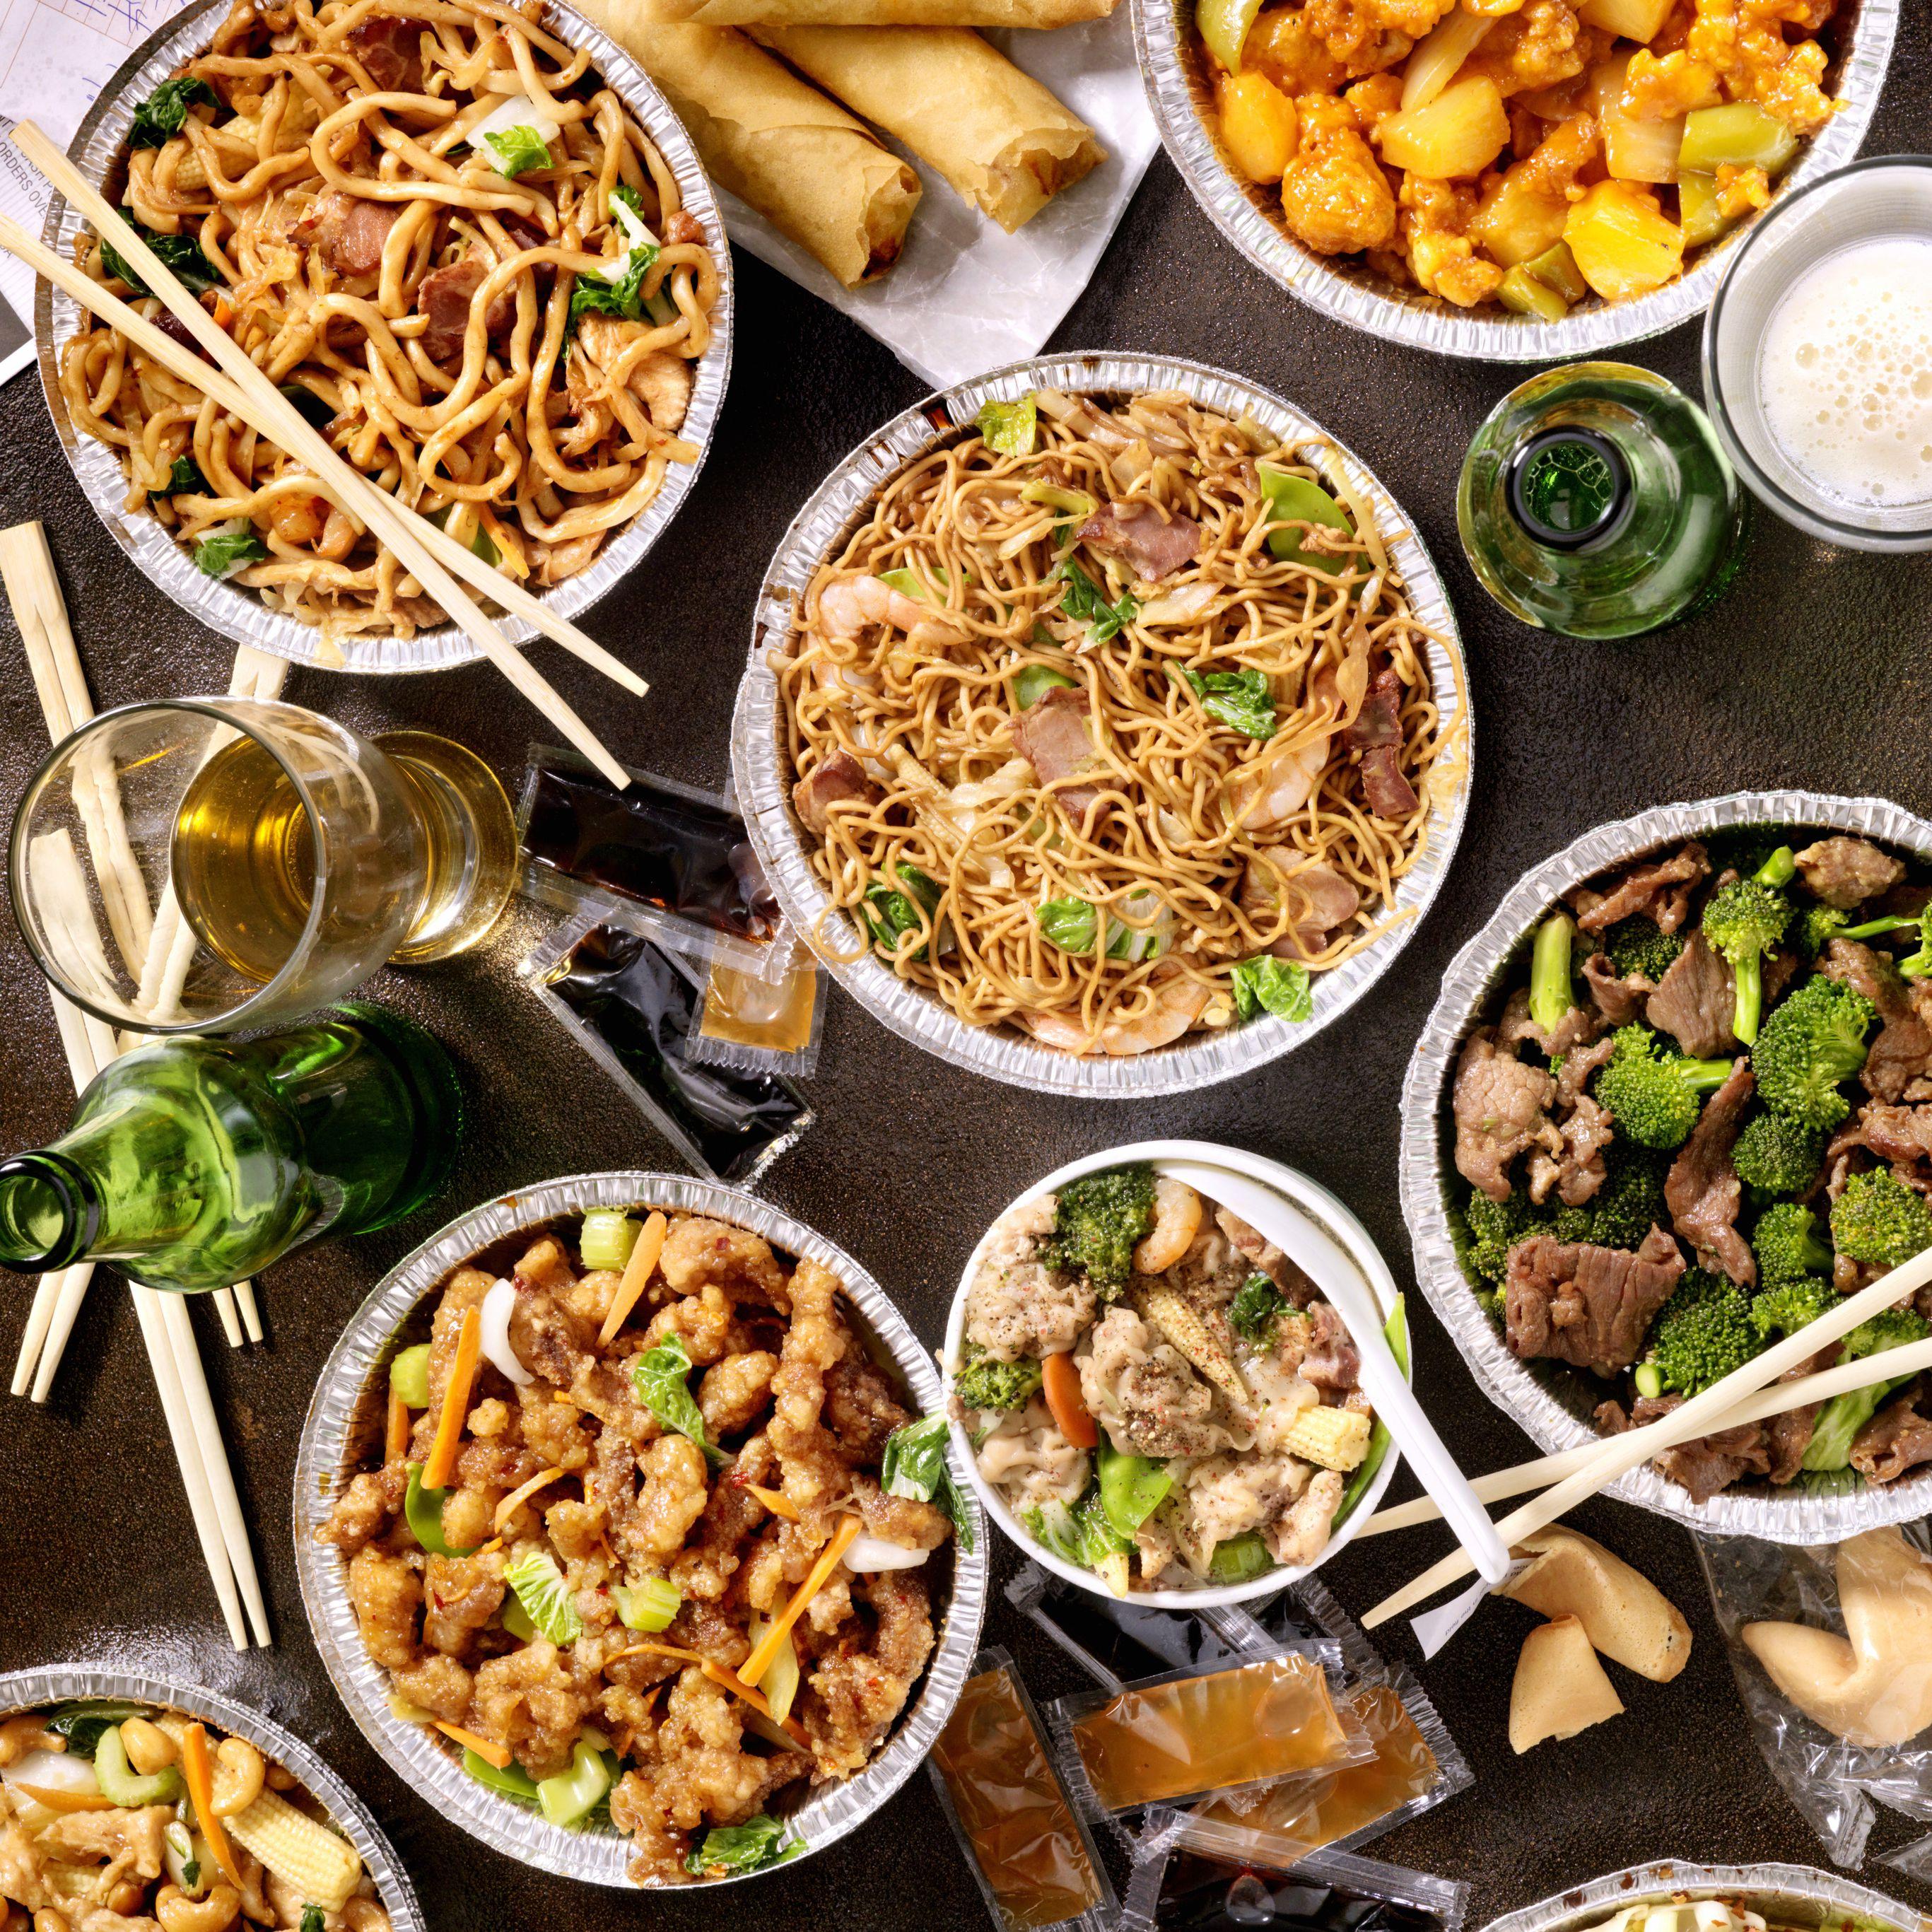 Fresh Asian Cuisine Menu Ideas